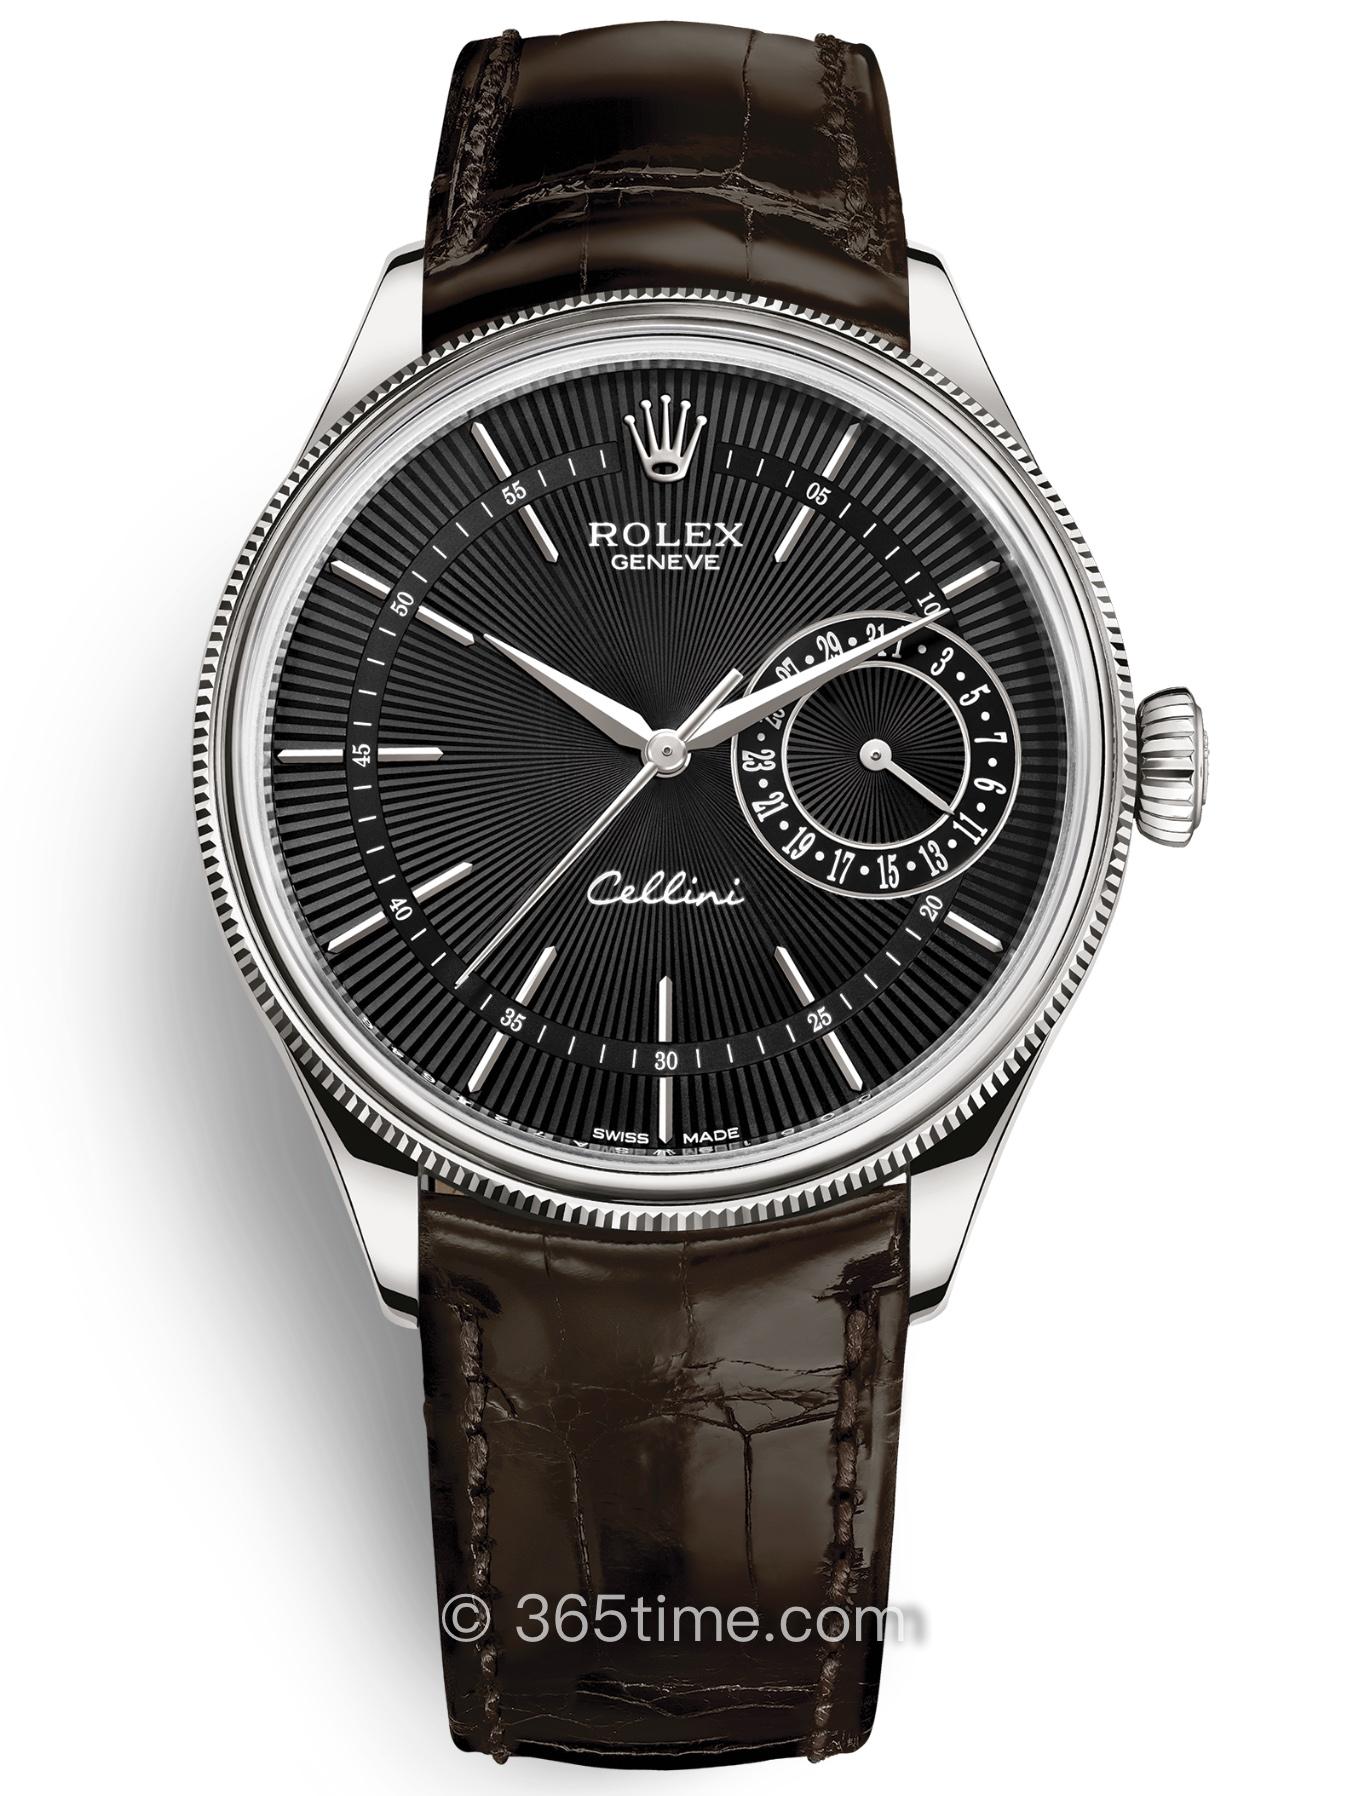 Rolex劳力士切利尼日历型腕表50519-0014